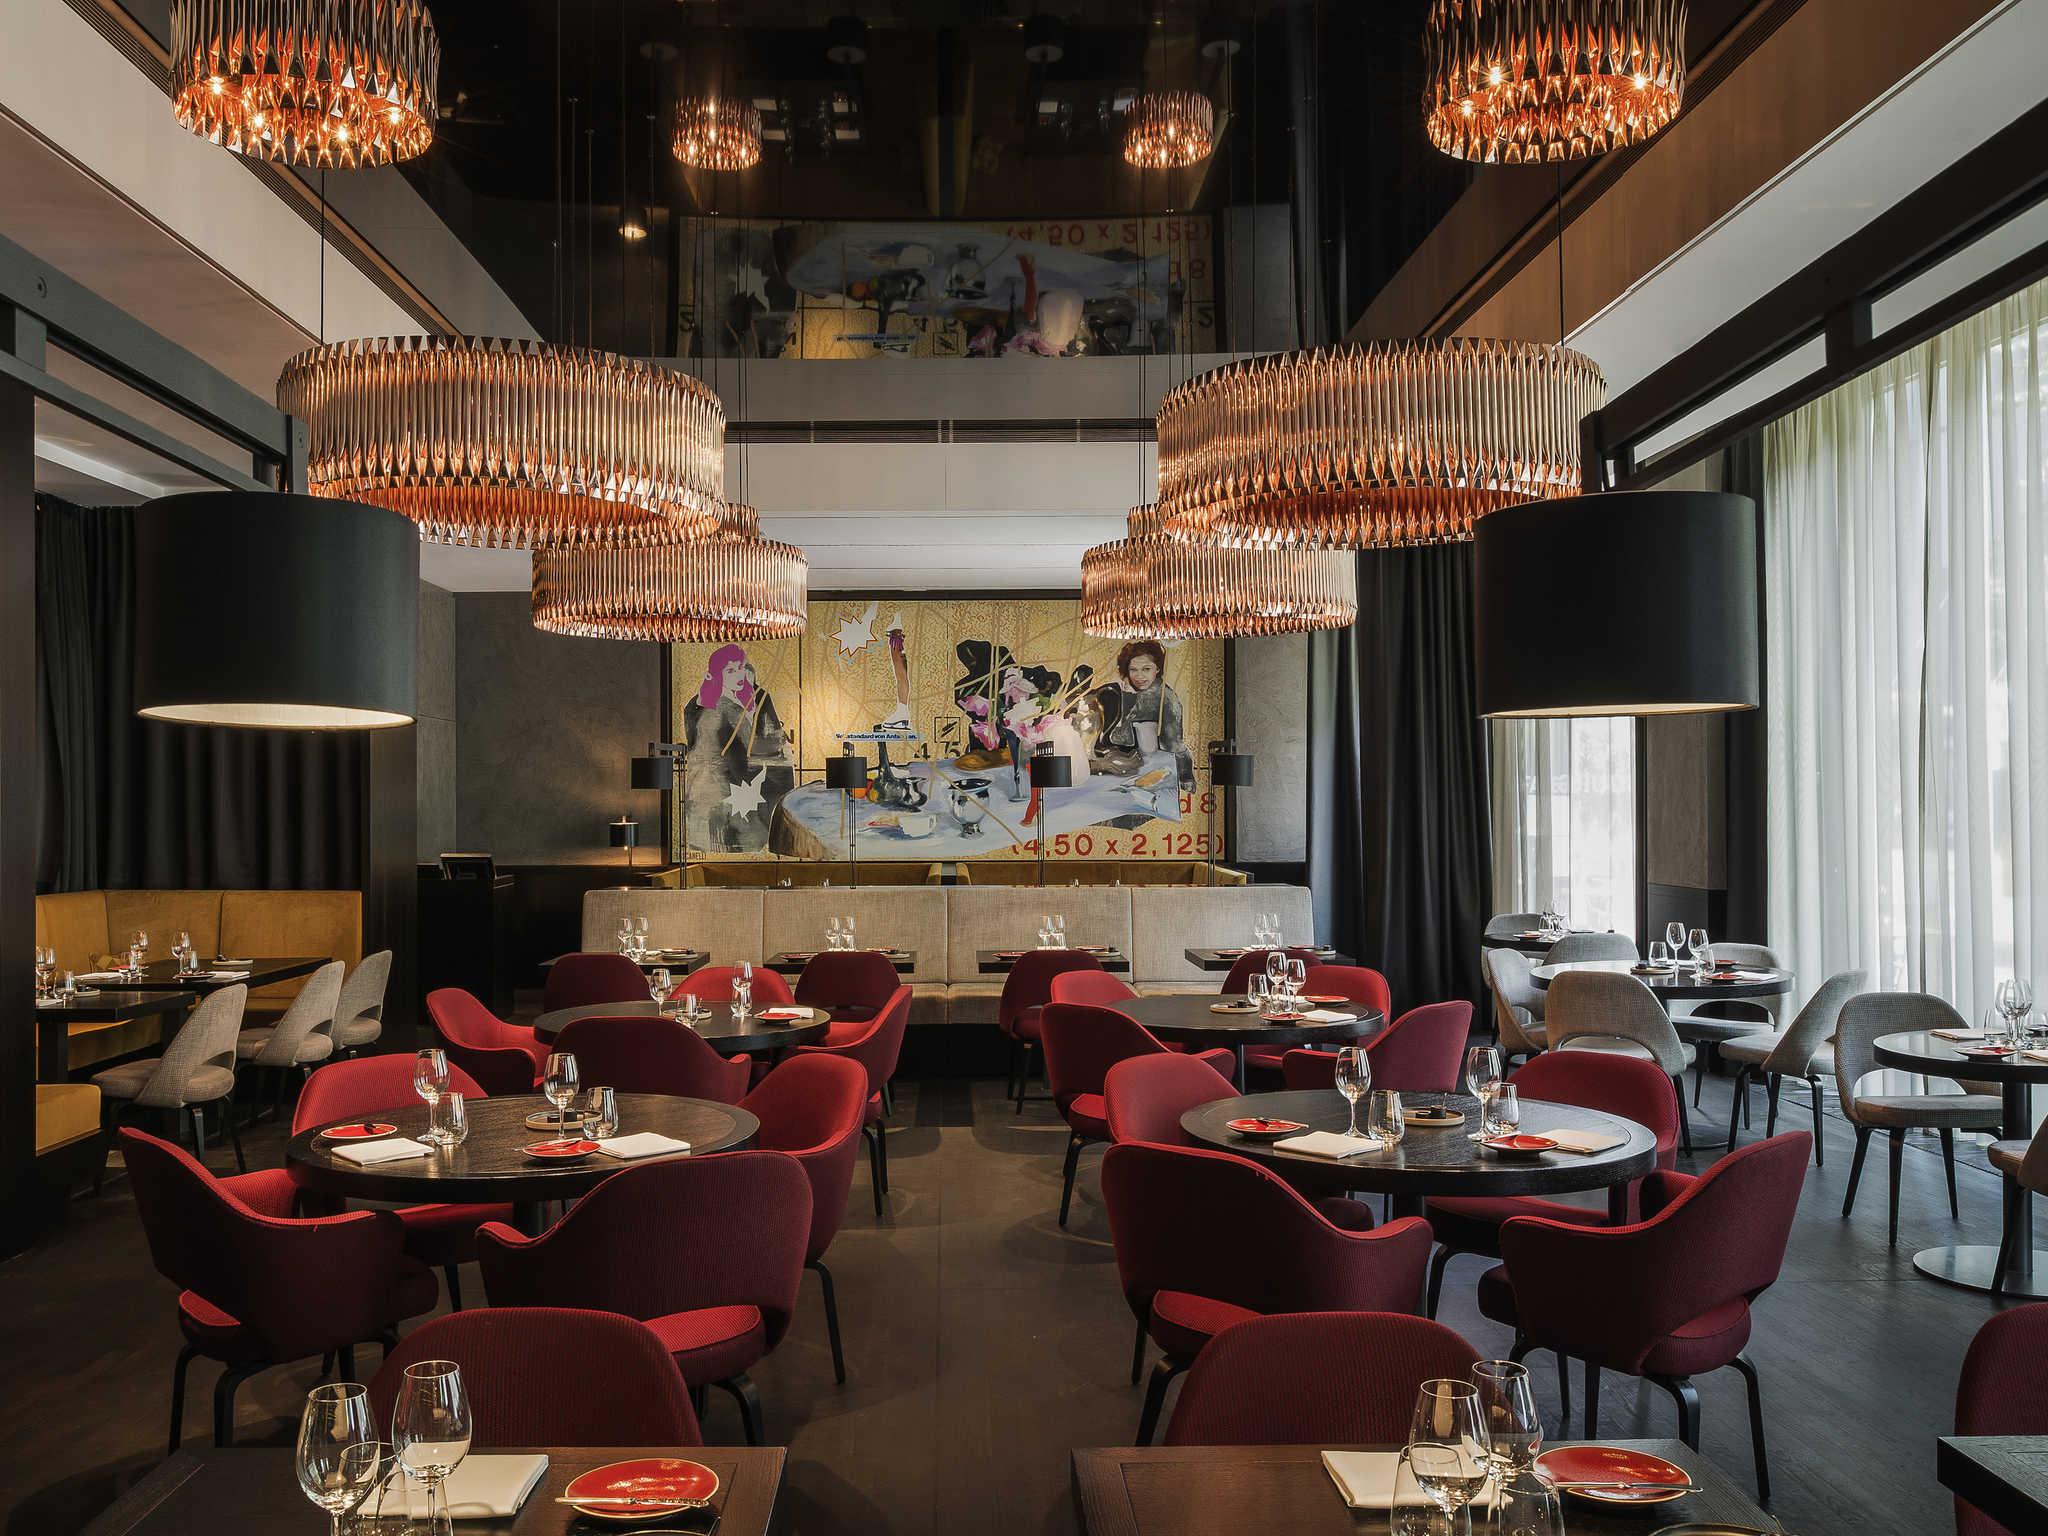 Hotel – Sofitel Berlin Kurfurstendamm